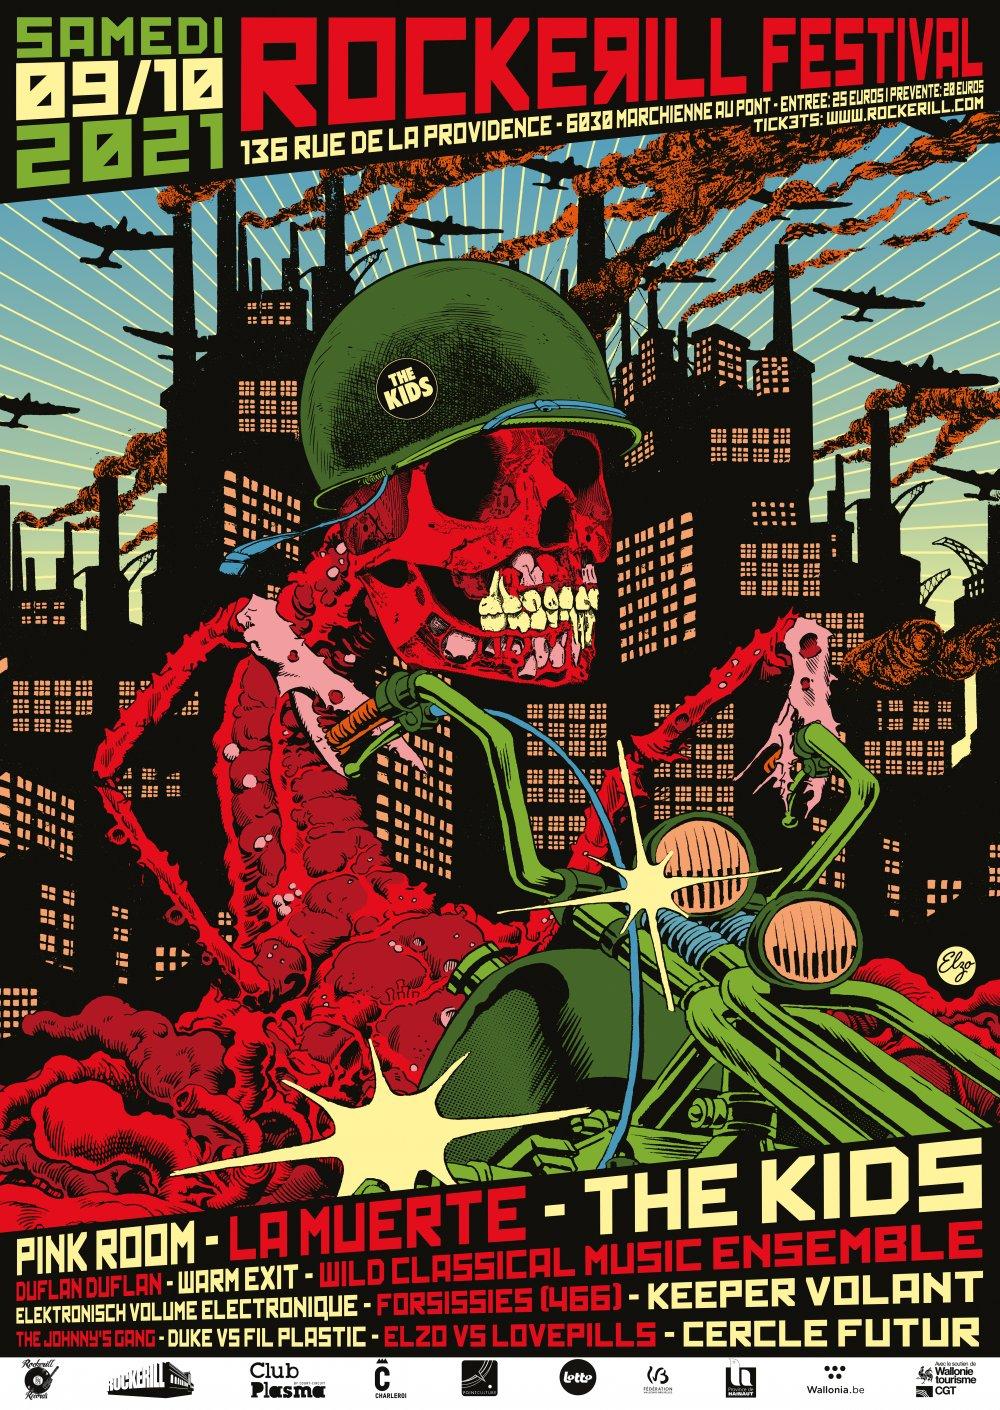 ROCKERILL FESTIVAL: The Kids + La Muerte & more